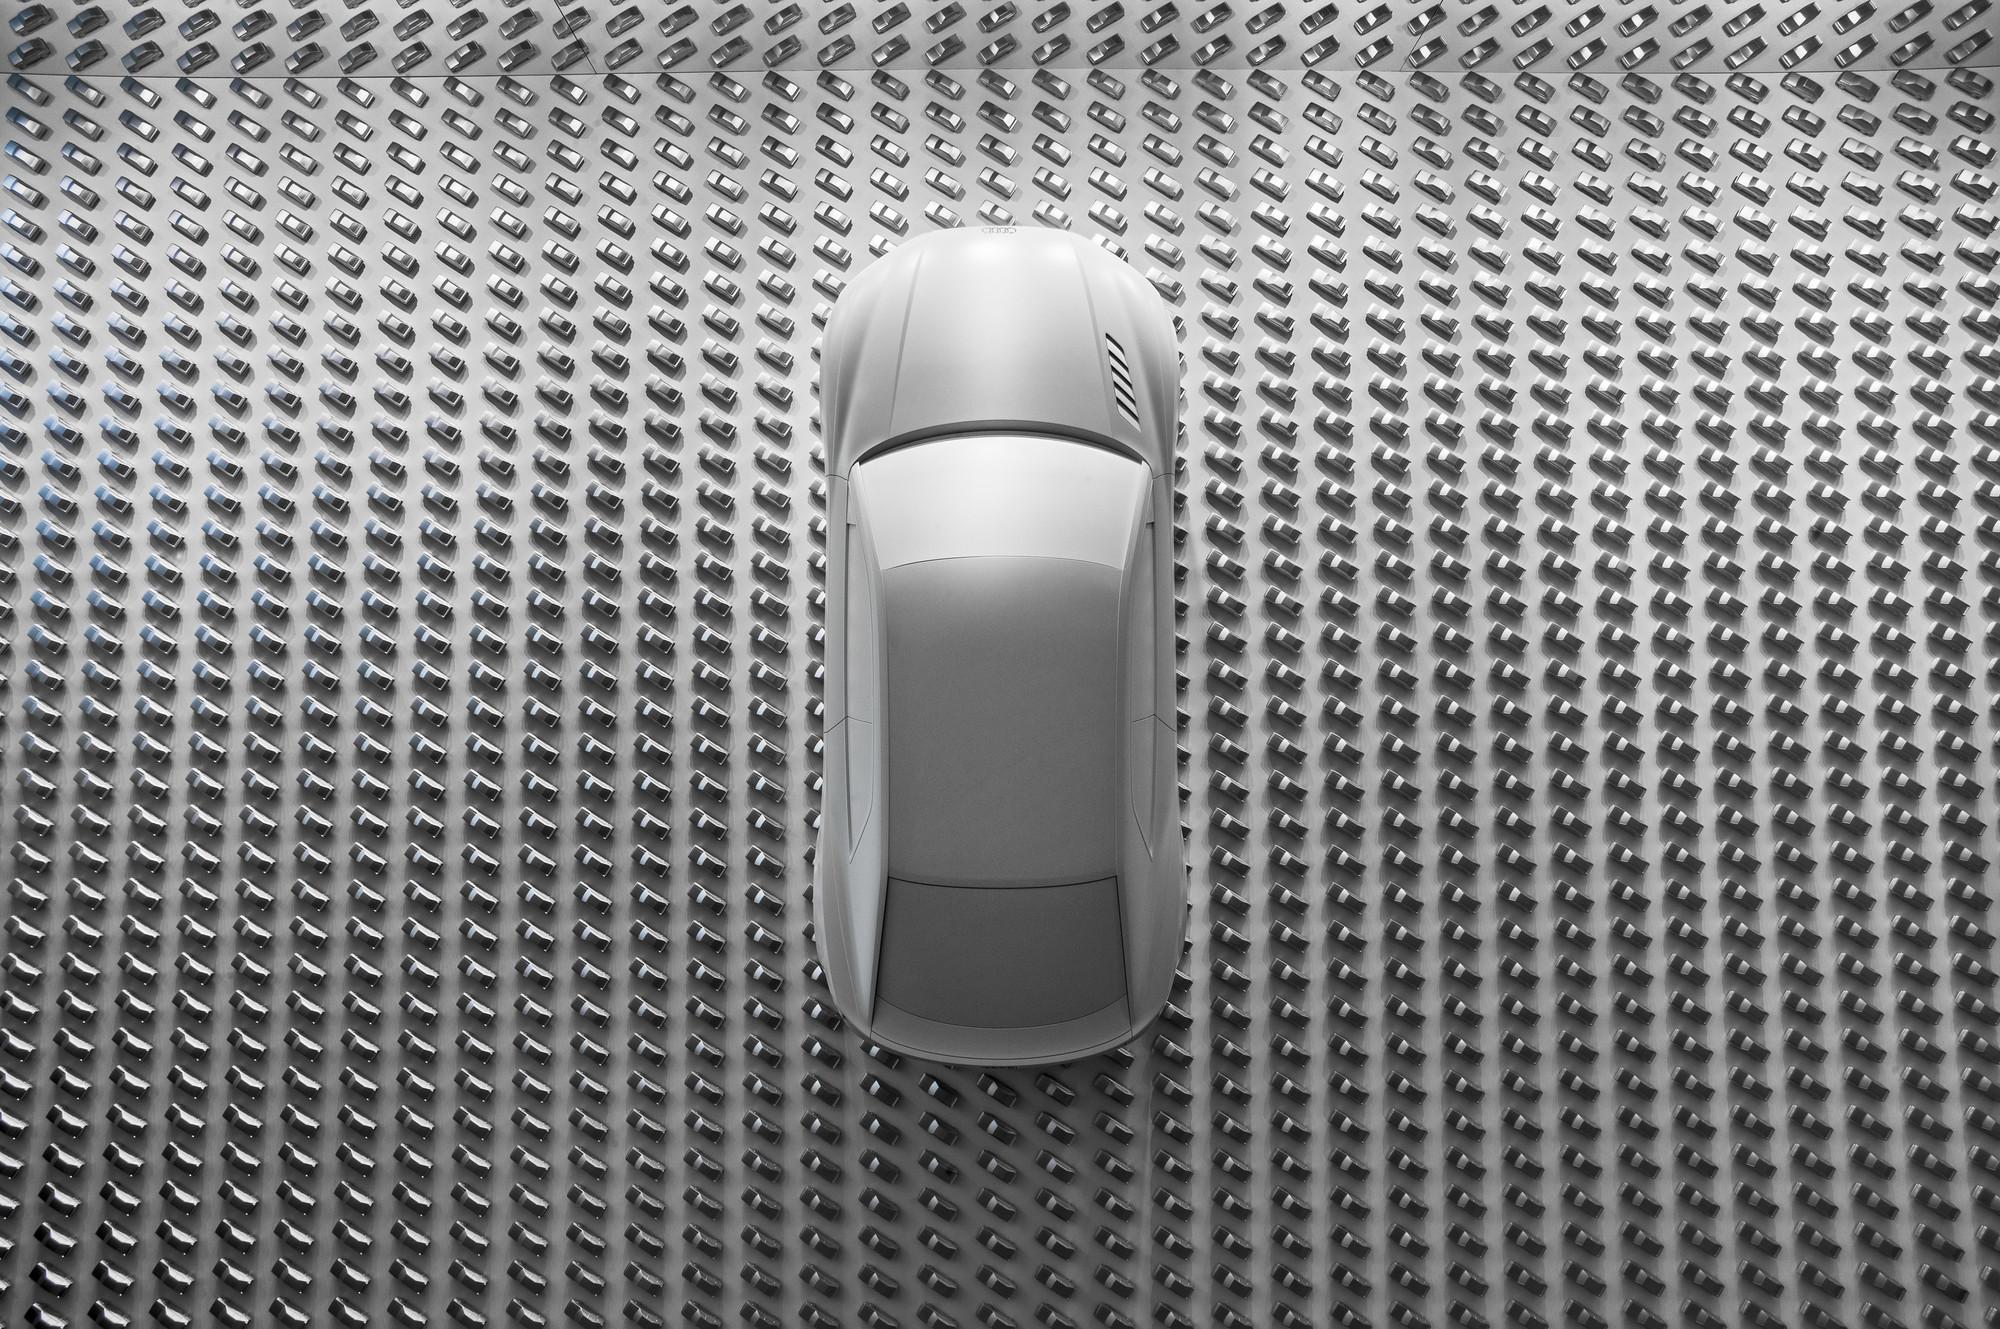 Audi design wall at the Pinakothek der Moderne, © Audi